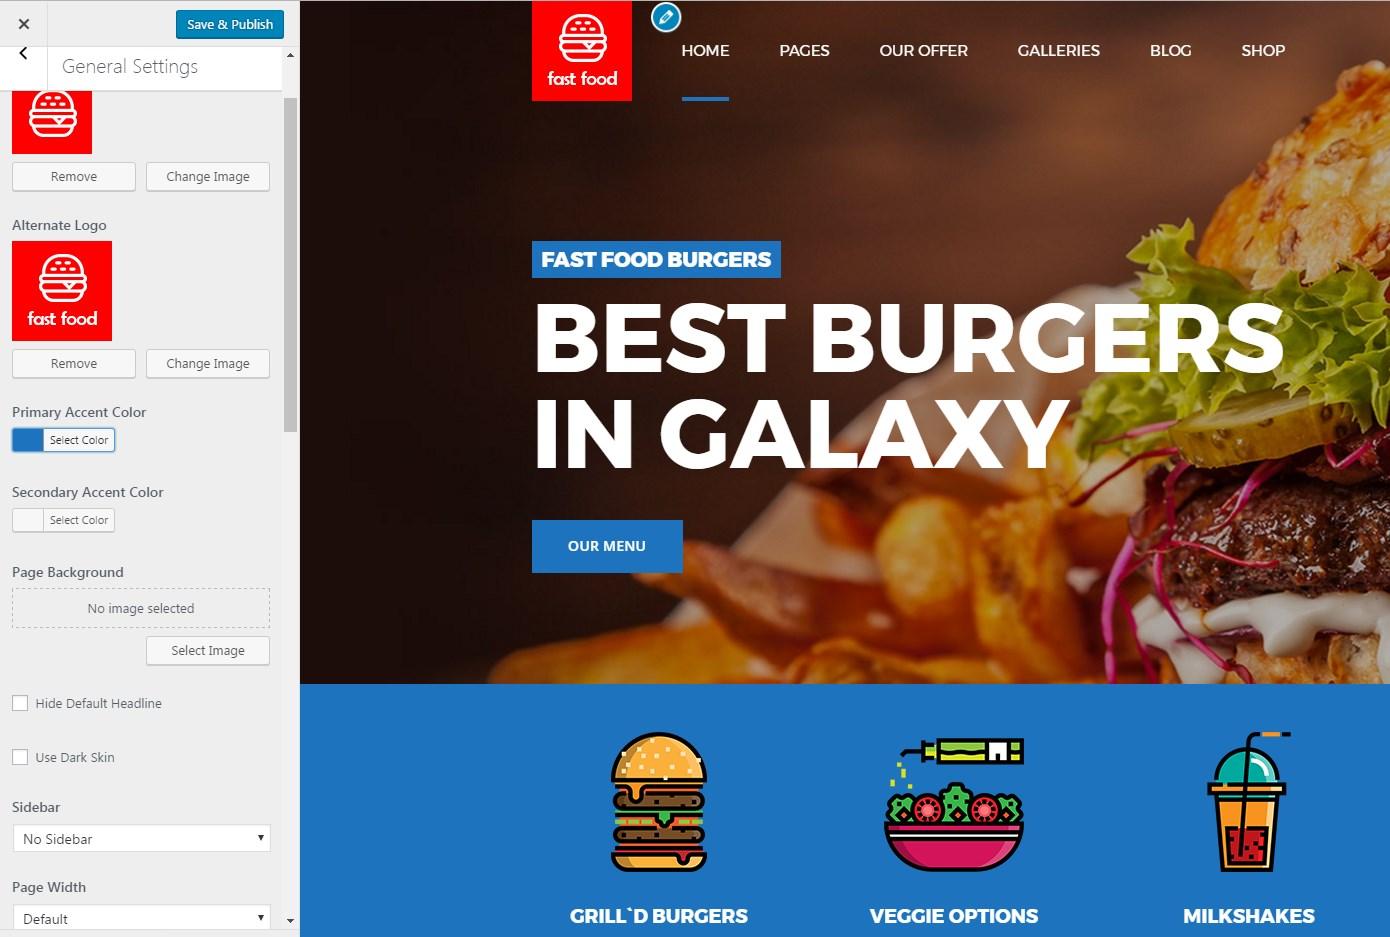 https://documentation.bold-themes.com/fast-food/wp-content/uploads/sites/13/2016/07/13-1-1.jpg